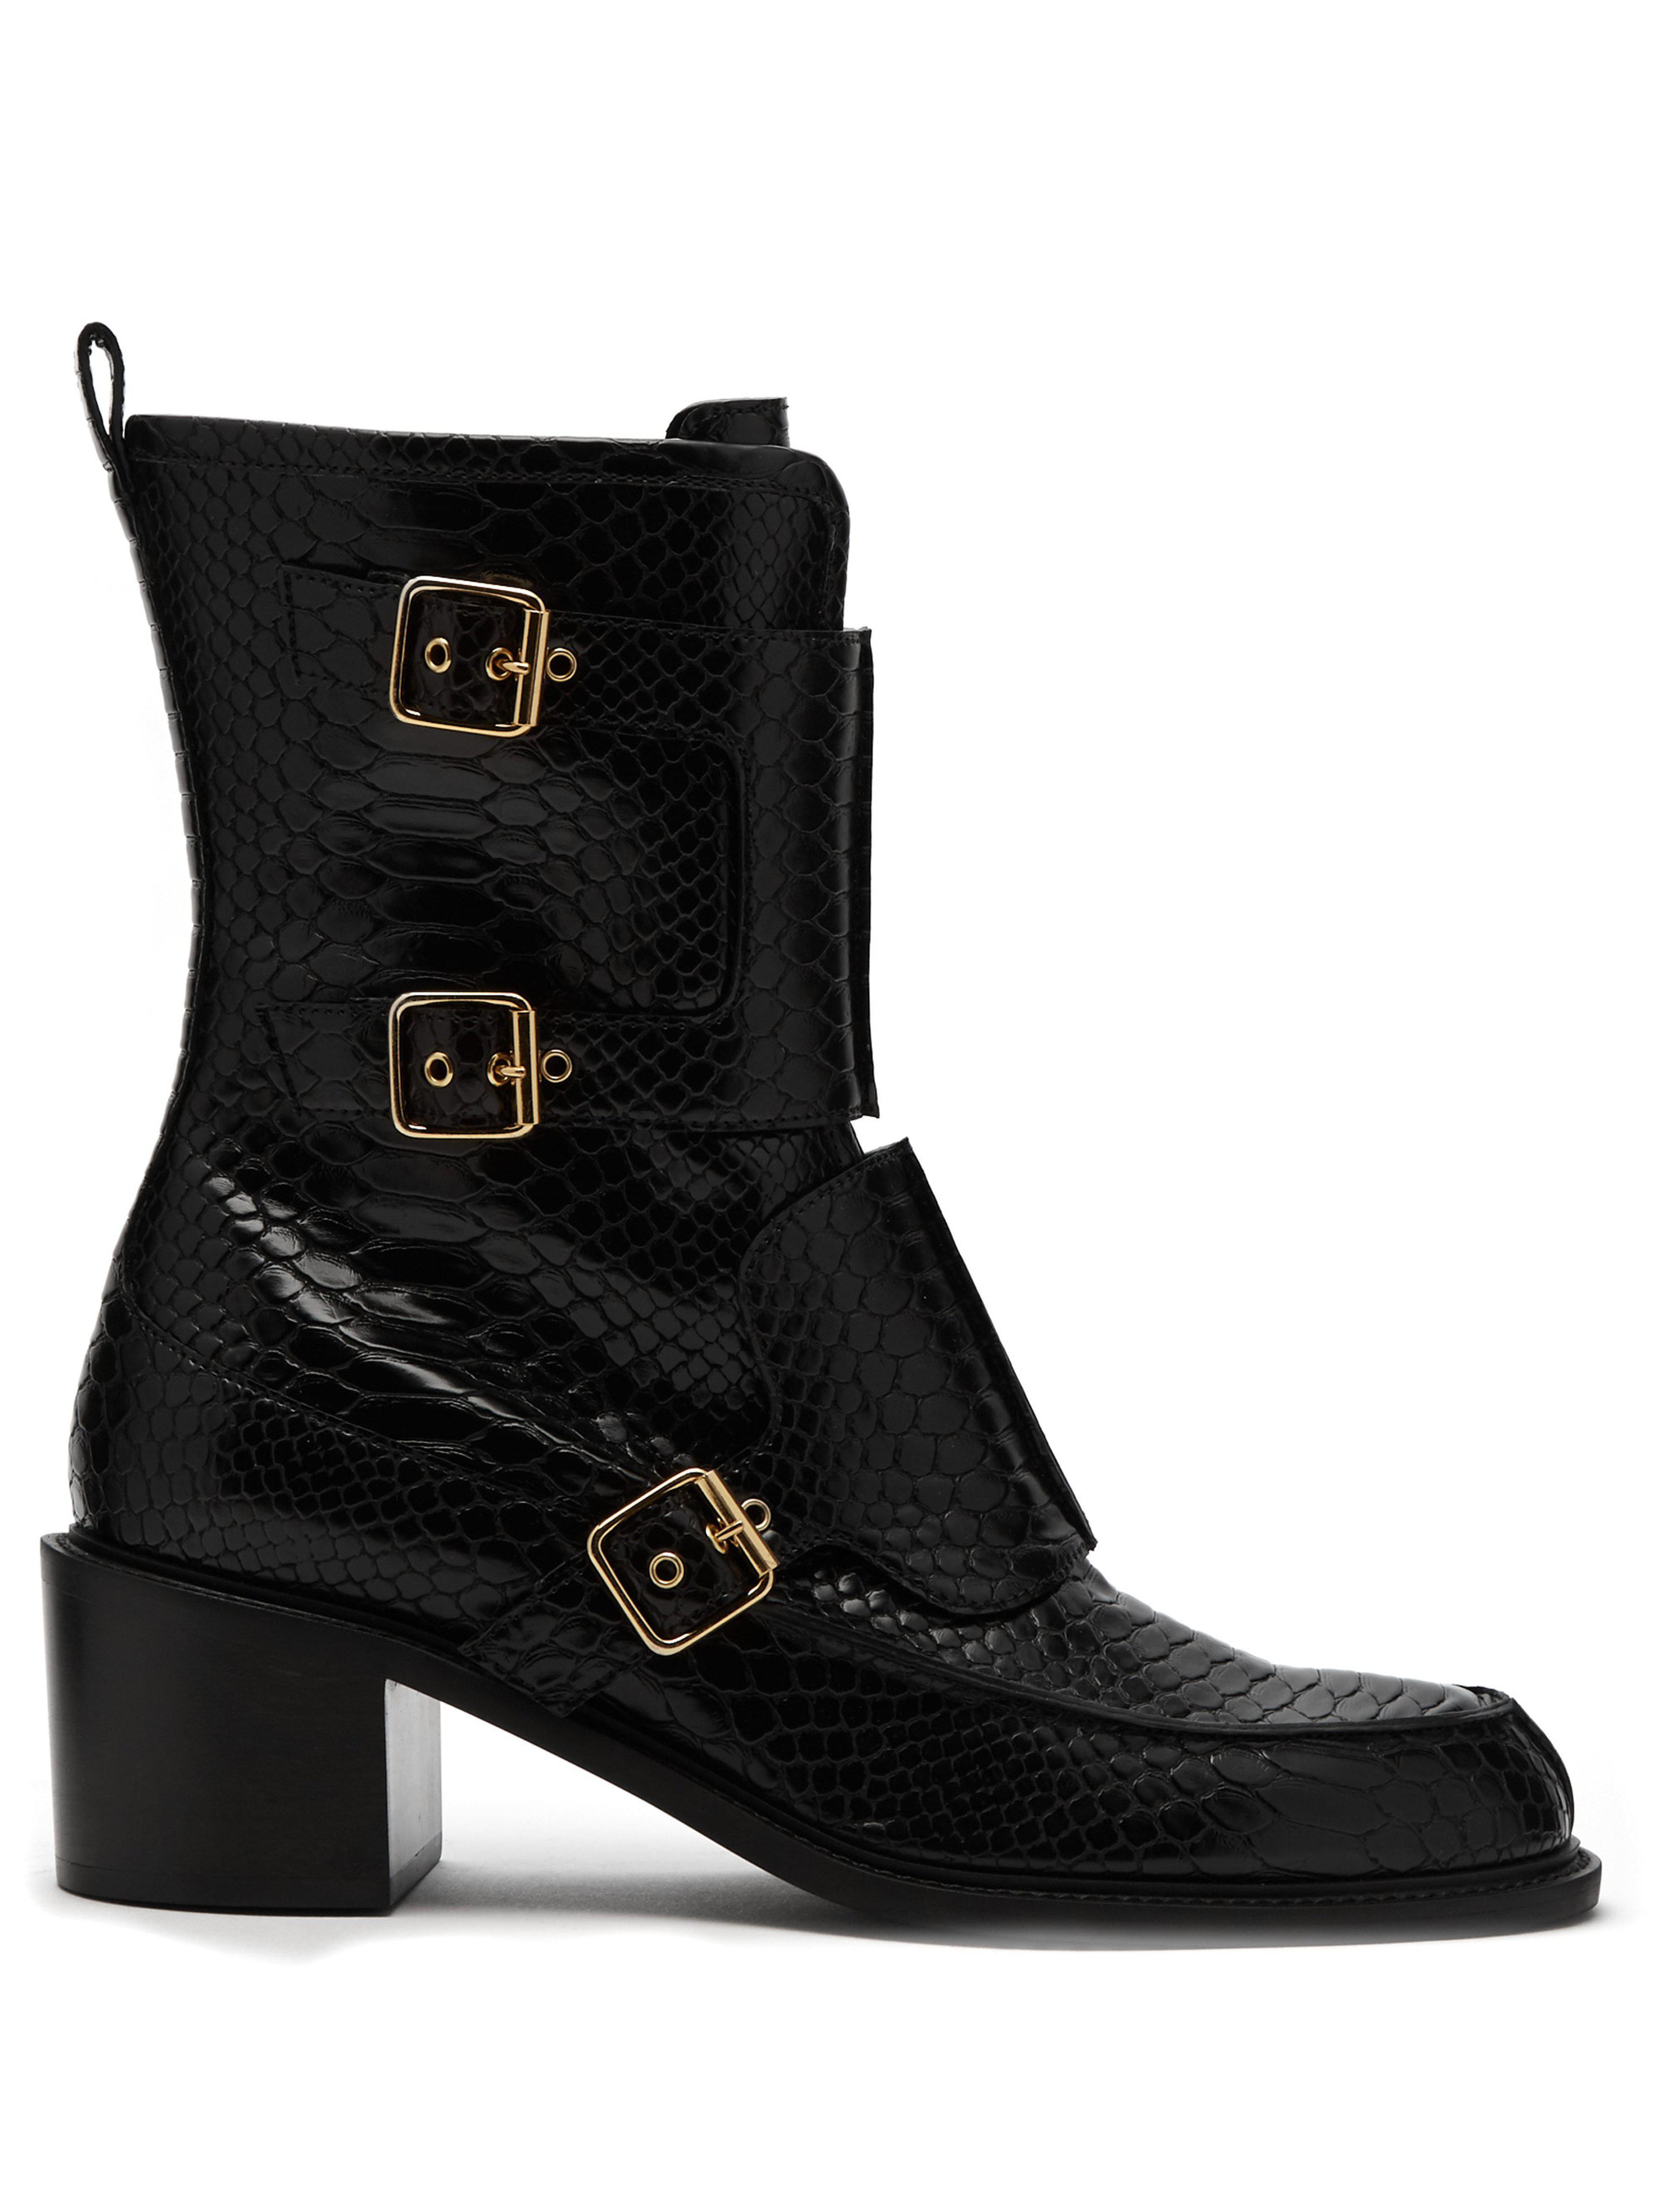 6120211b7d5 Stella McCartney Crocodile Effect Faux Leather Boots in Black - Save ...